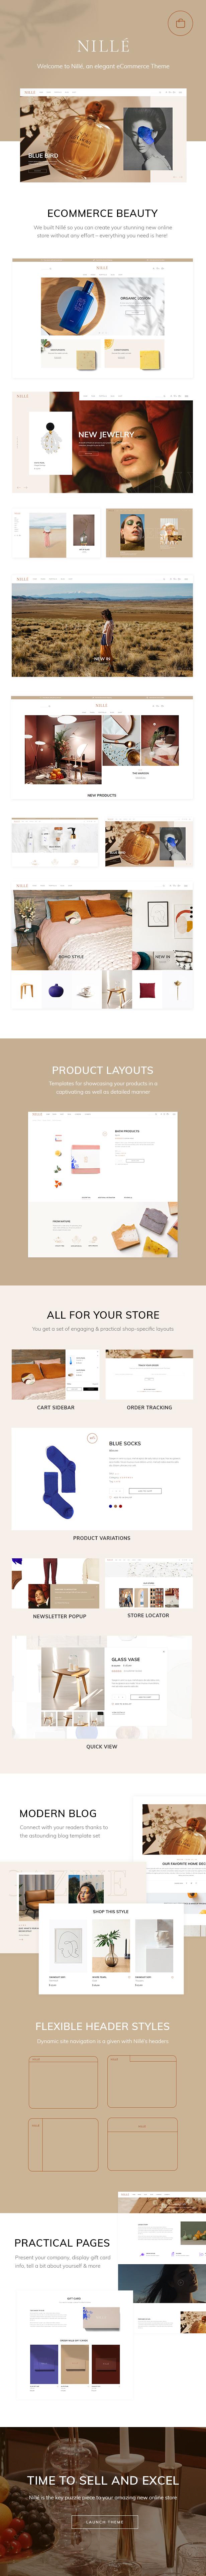 Nillé - Elegantes E-Commerce-Thema - 1